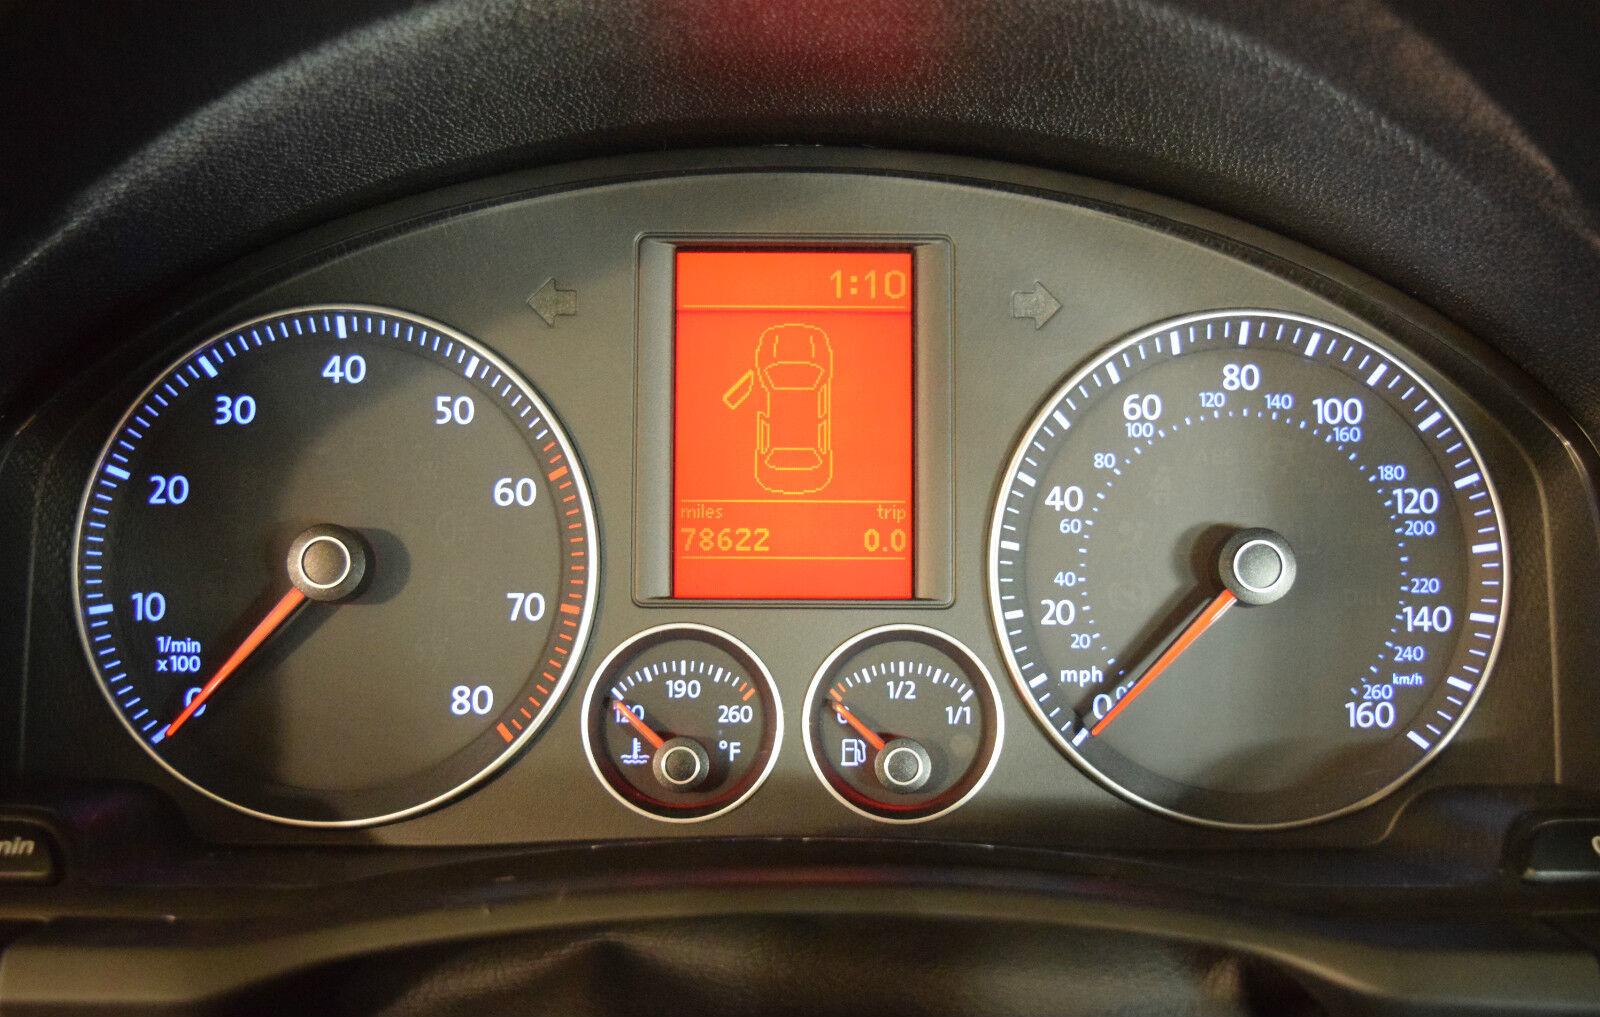 VOLKSWAGEN VW JETTA INSTRUMENT CLUSTER LCD DISPLAY 2005 2006 2007 2008 2009 NEW | eBay